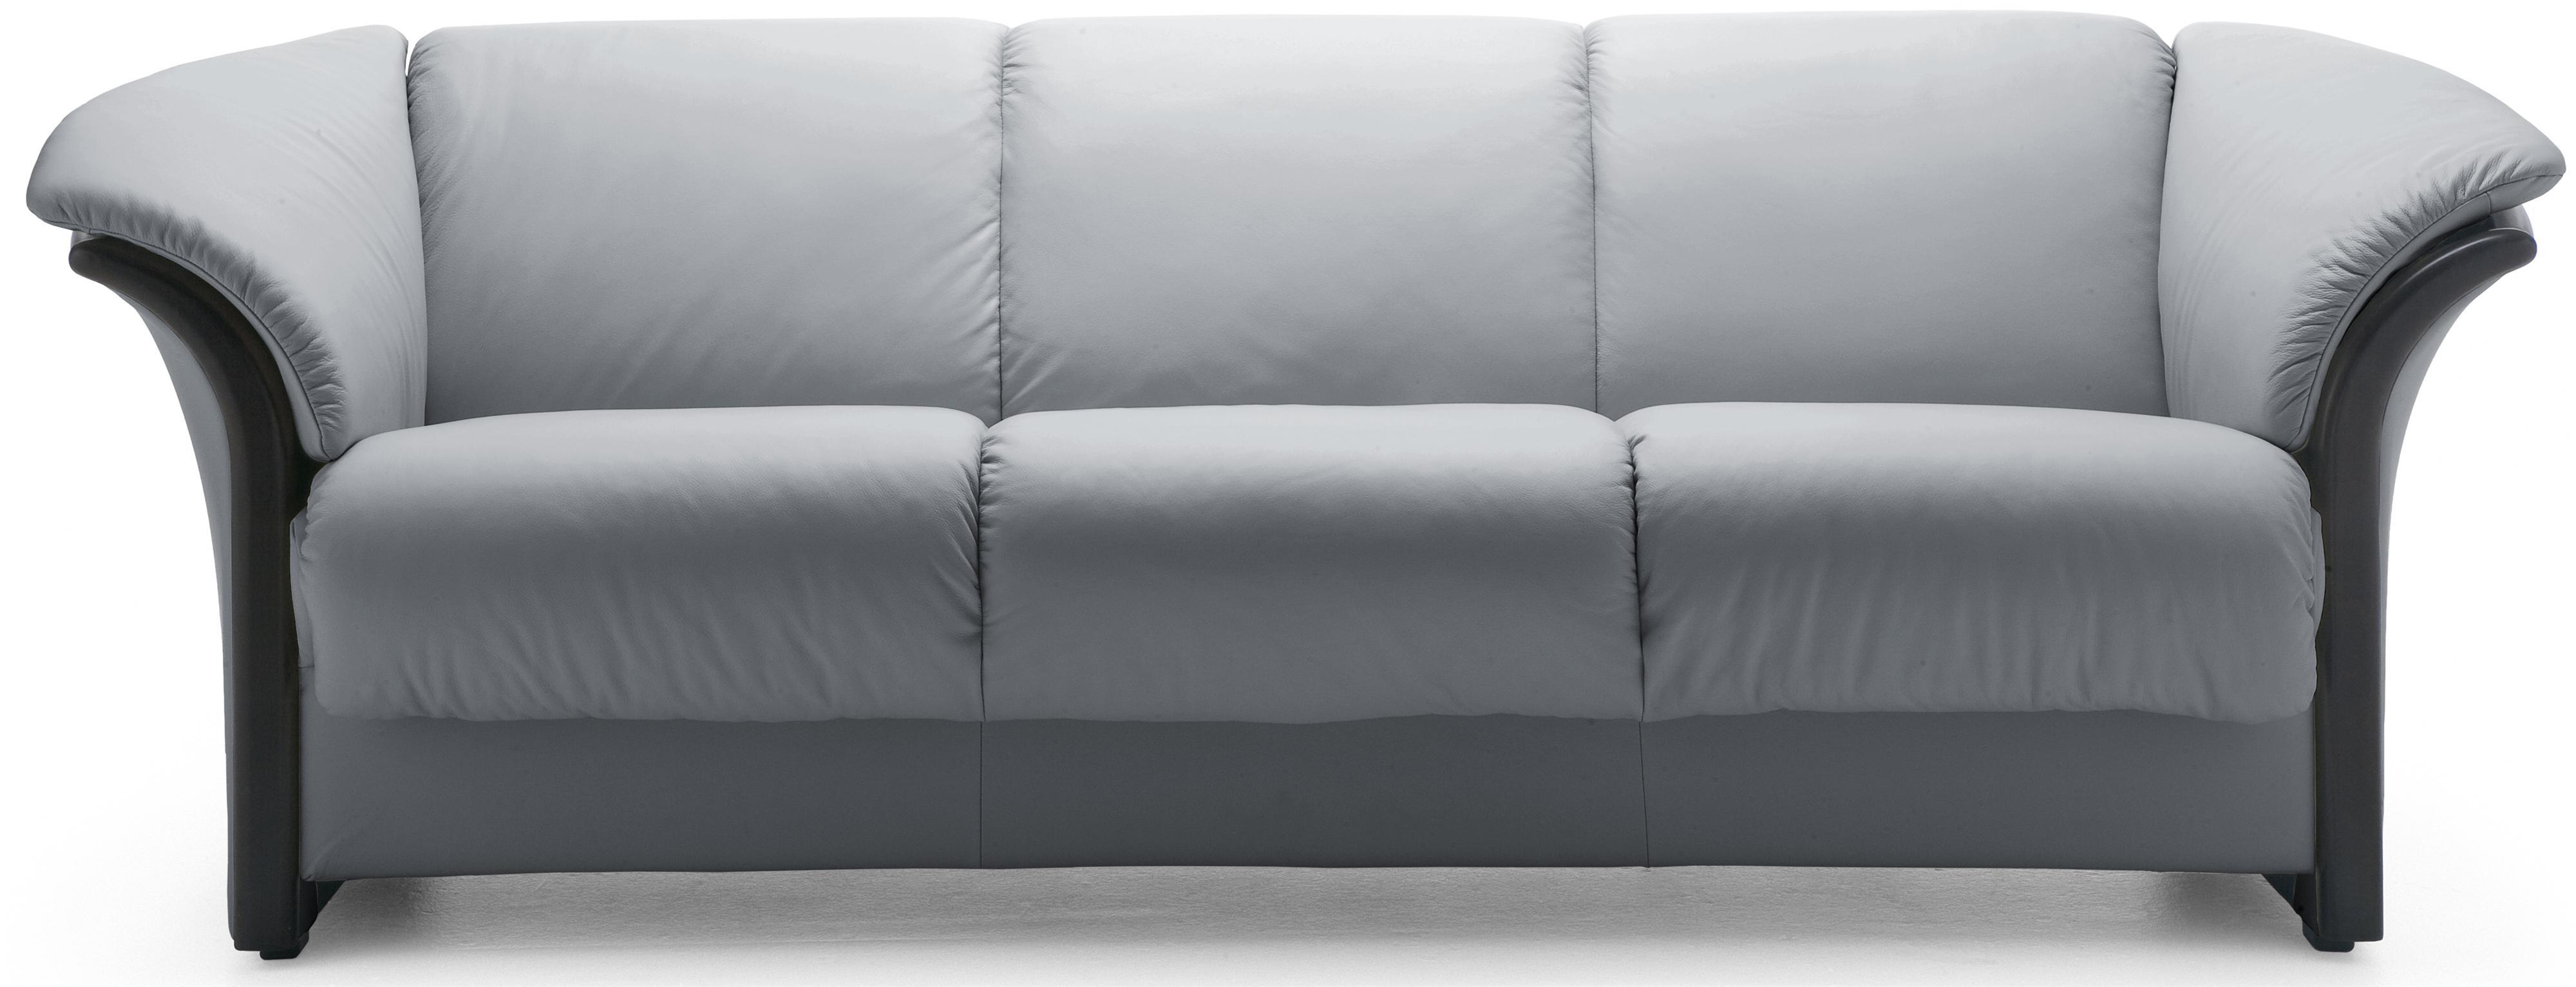 stressless by ekornes manhattan 2252030 manhattan stationary sofa hudson 39 s furniture sofa. Black Bedroom Furniture Sets. Home Design Ideas